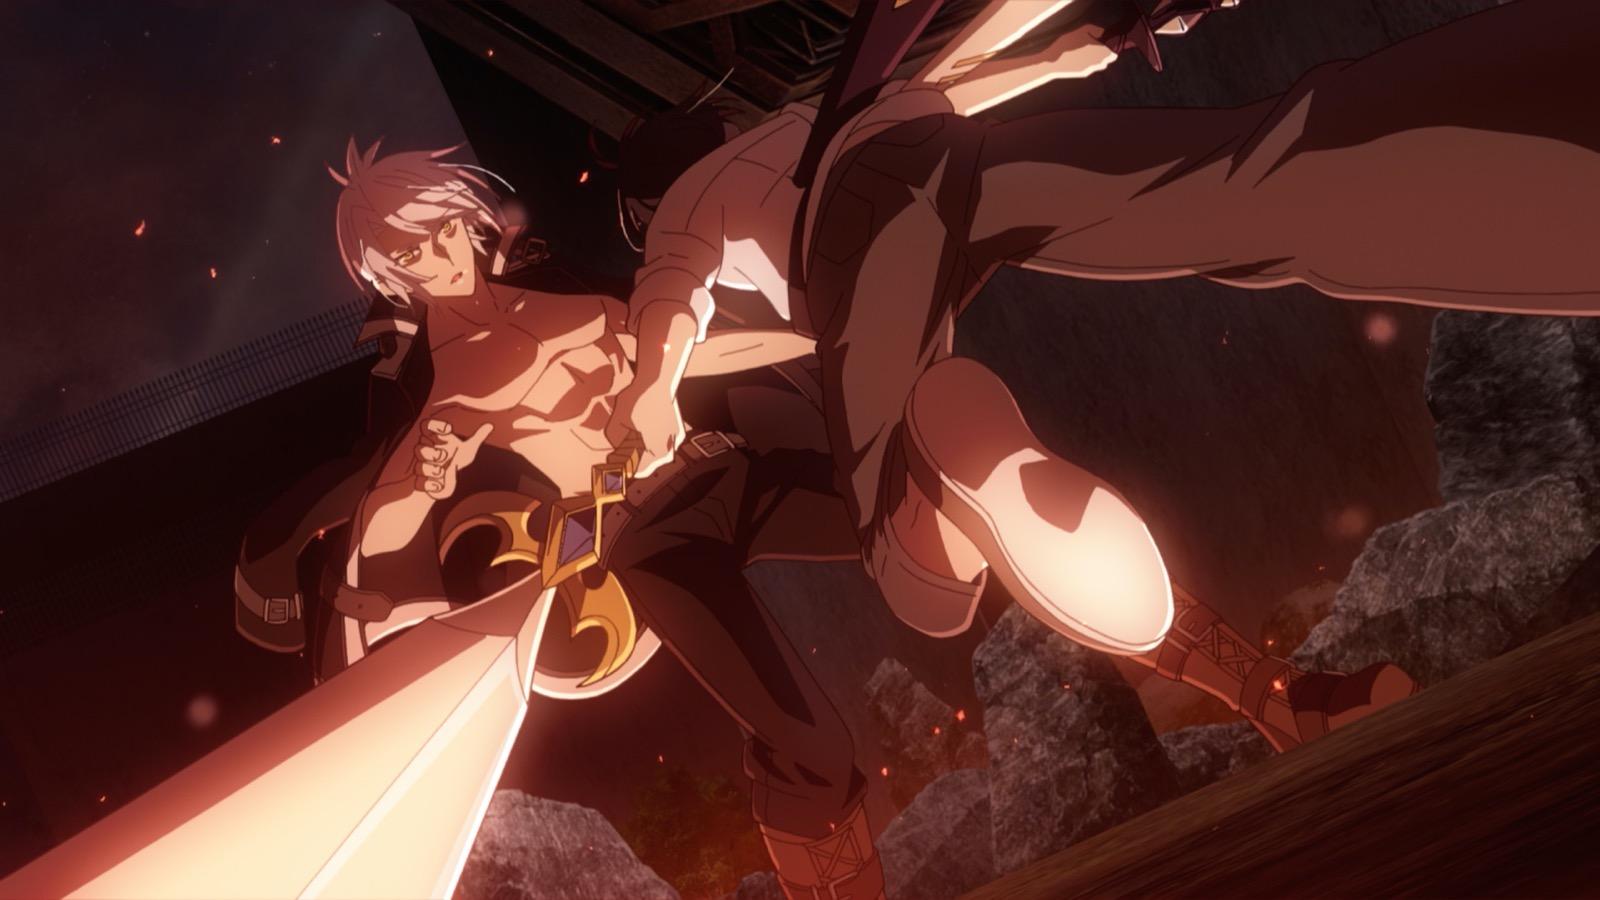 Kimi to Boku no Saigo no Senjou - Capítulo 9